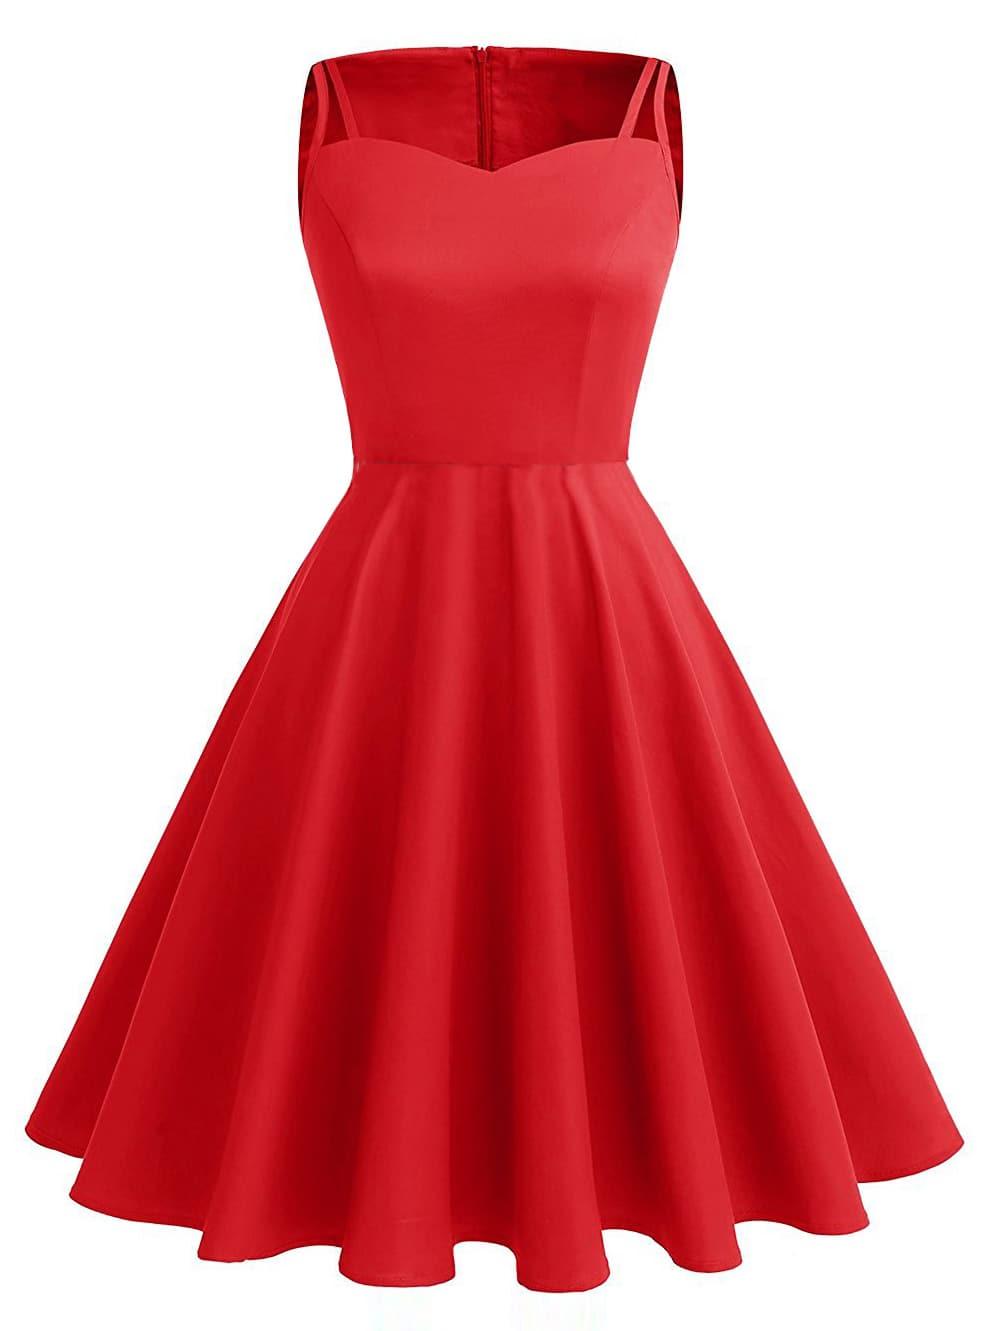 Cut Out Detail Swing Dress